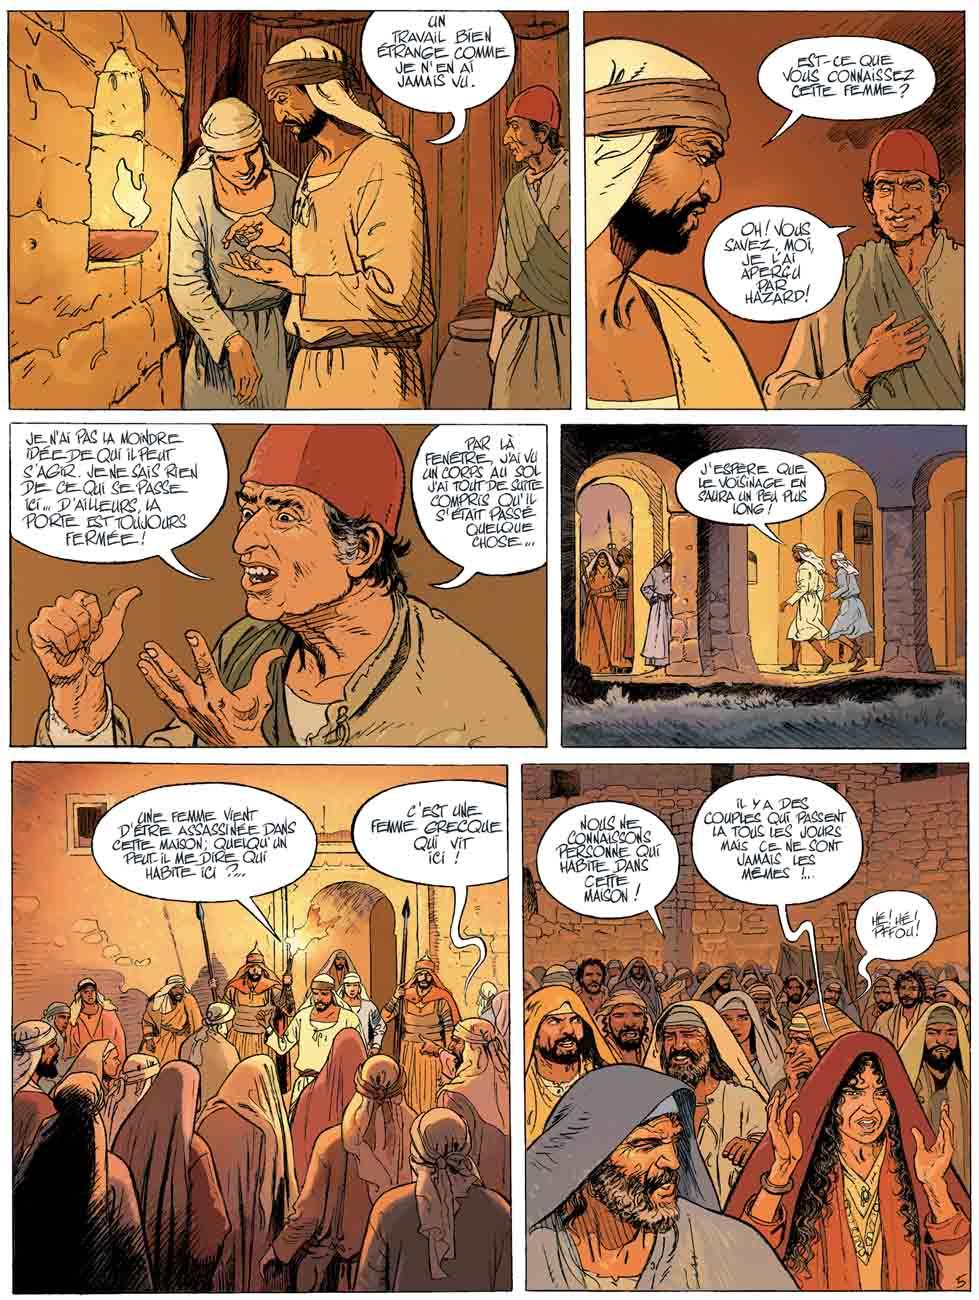 Le Samaritain - Bethsabee de Jerusalem